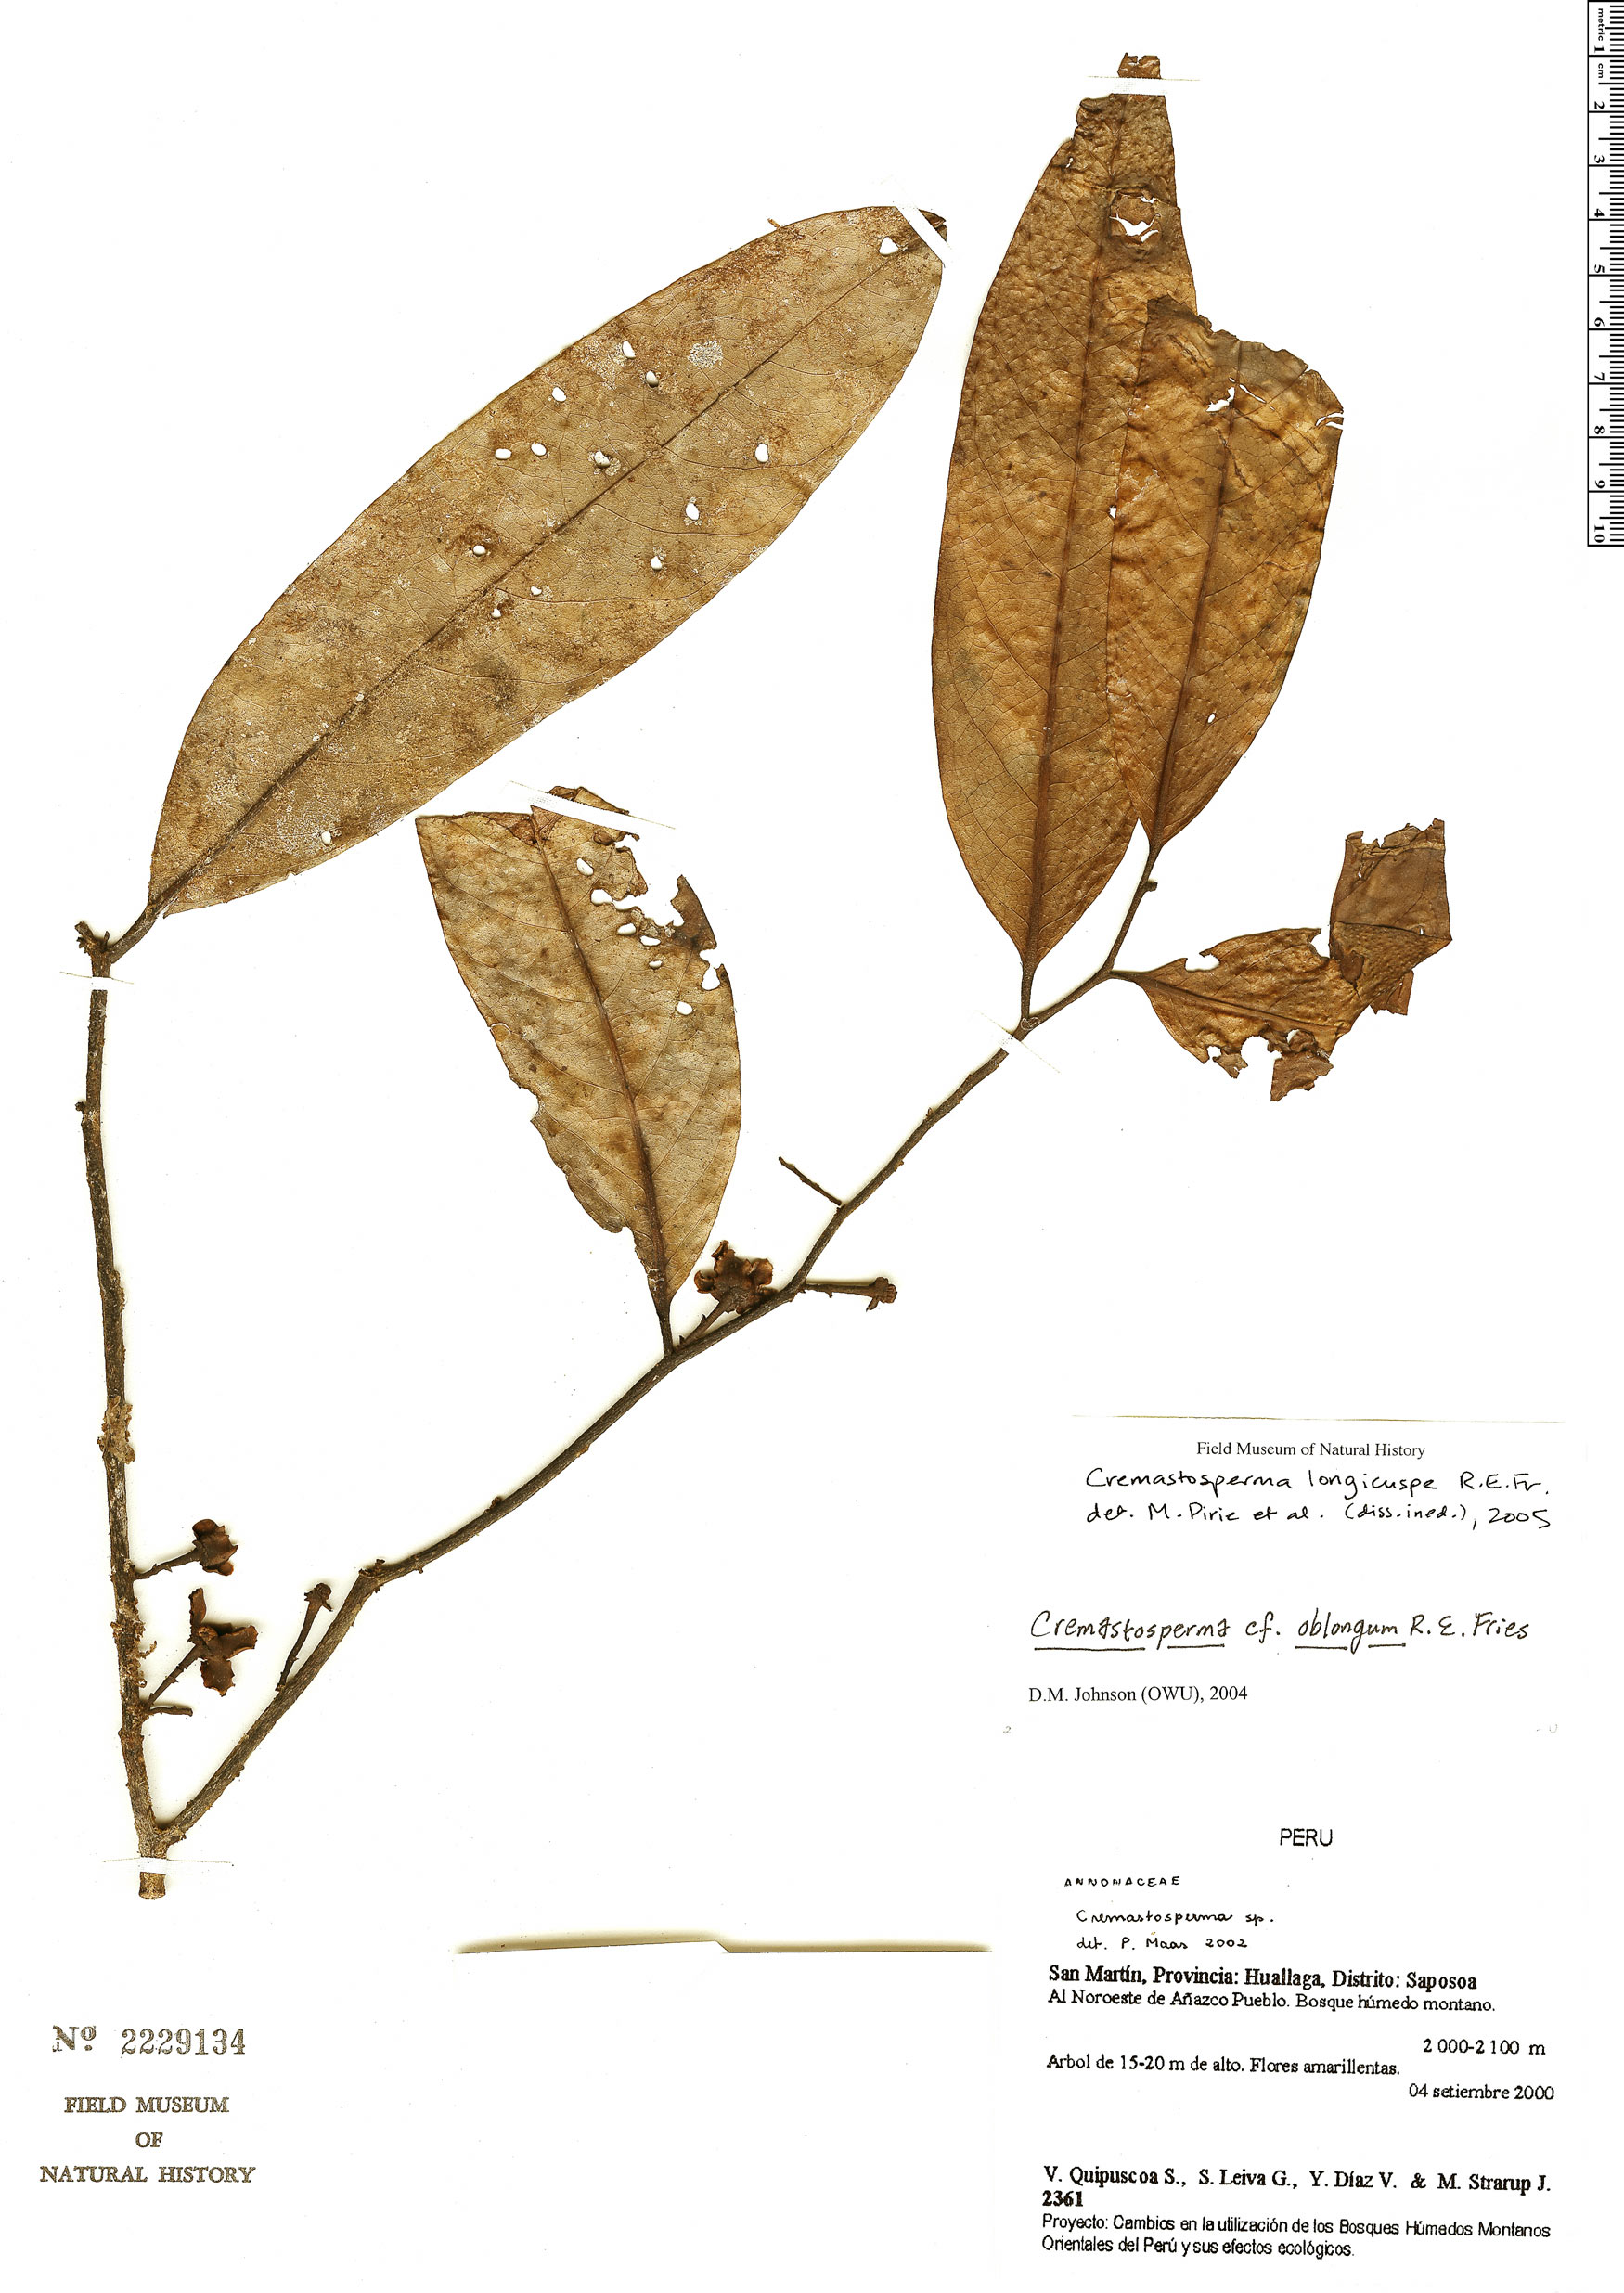 Espécimen: Cremastosperma longicuspe